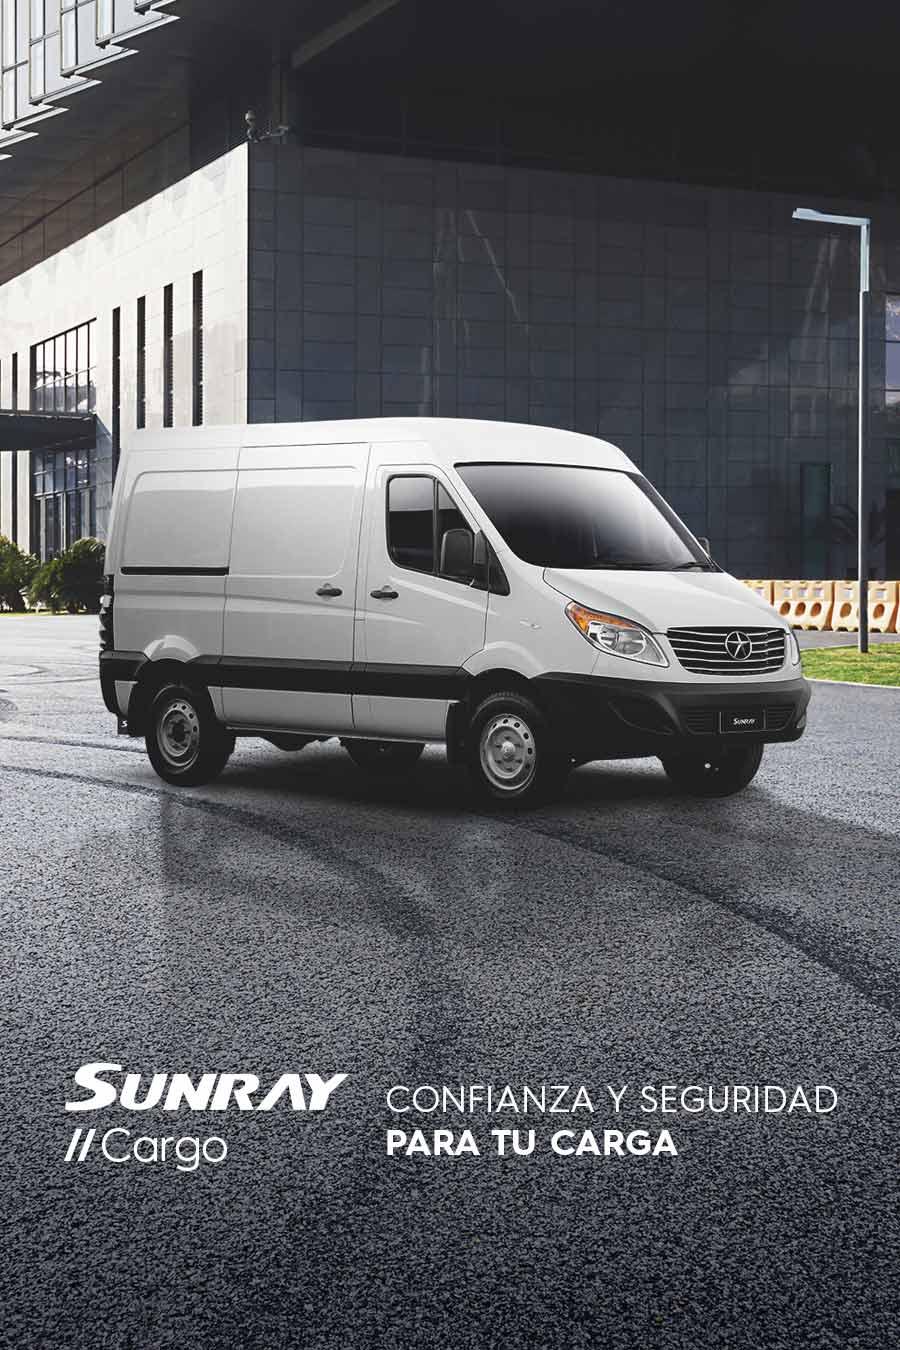 Sunray Cargo